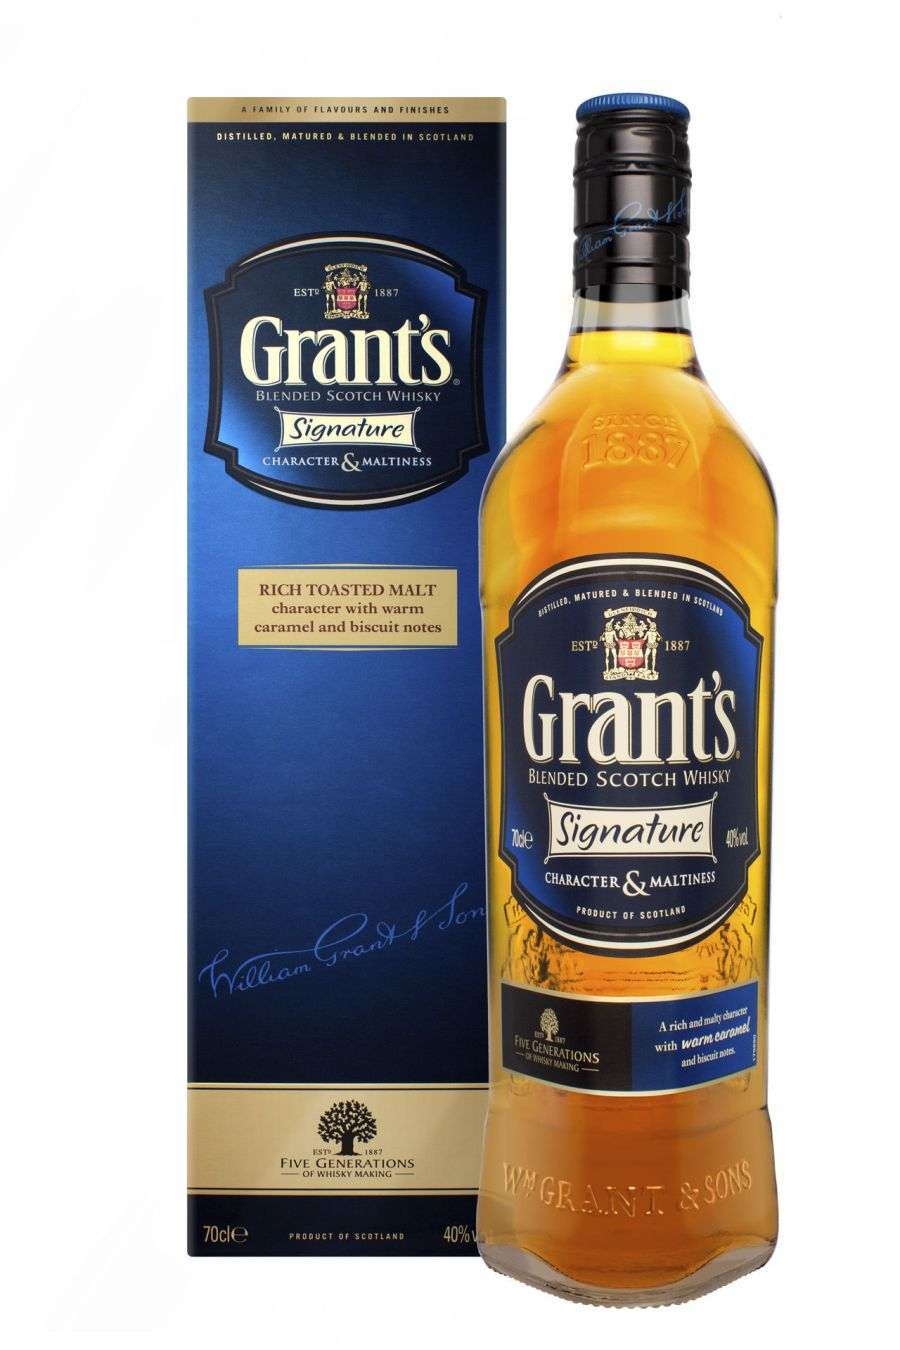 Grants_Signature_Global_(2_labels)_face_on_Bottle_&_Box_Images_large